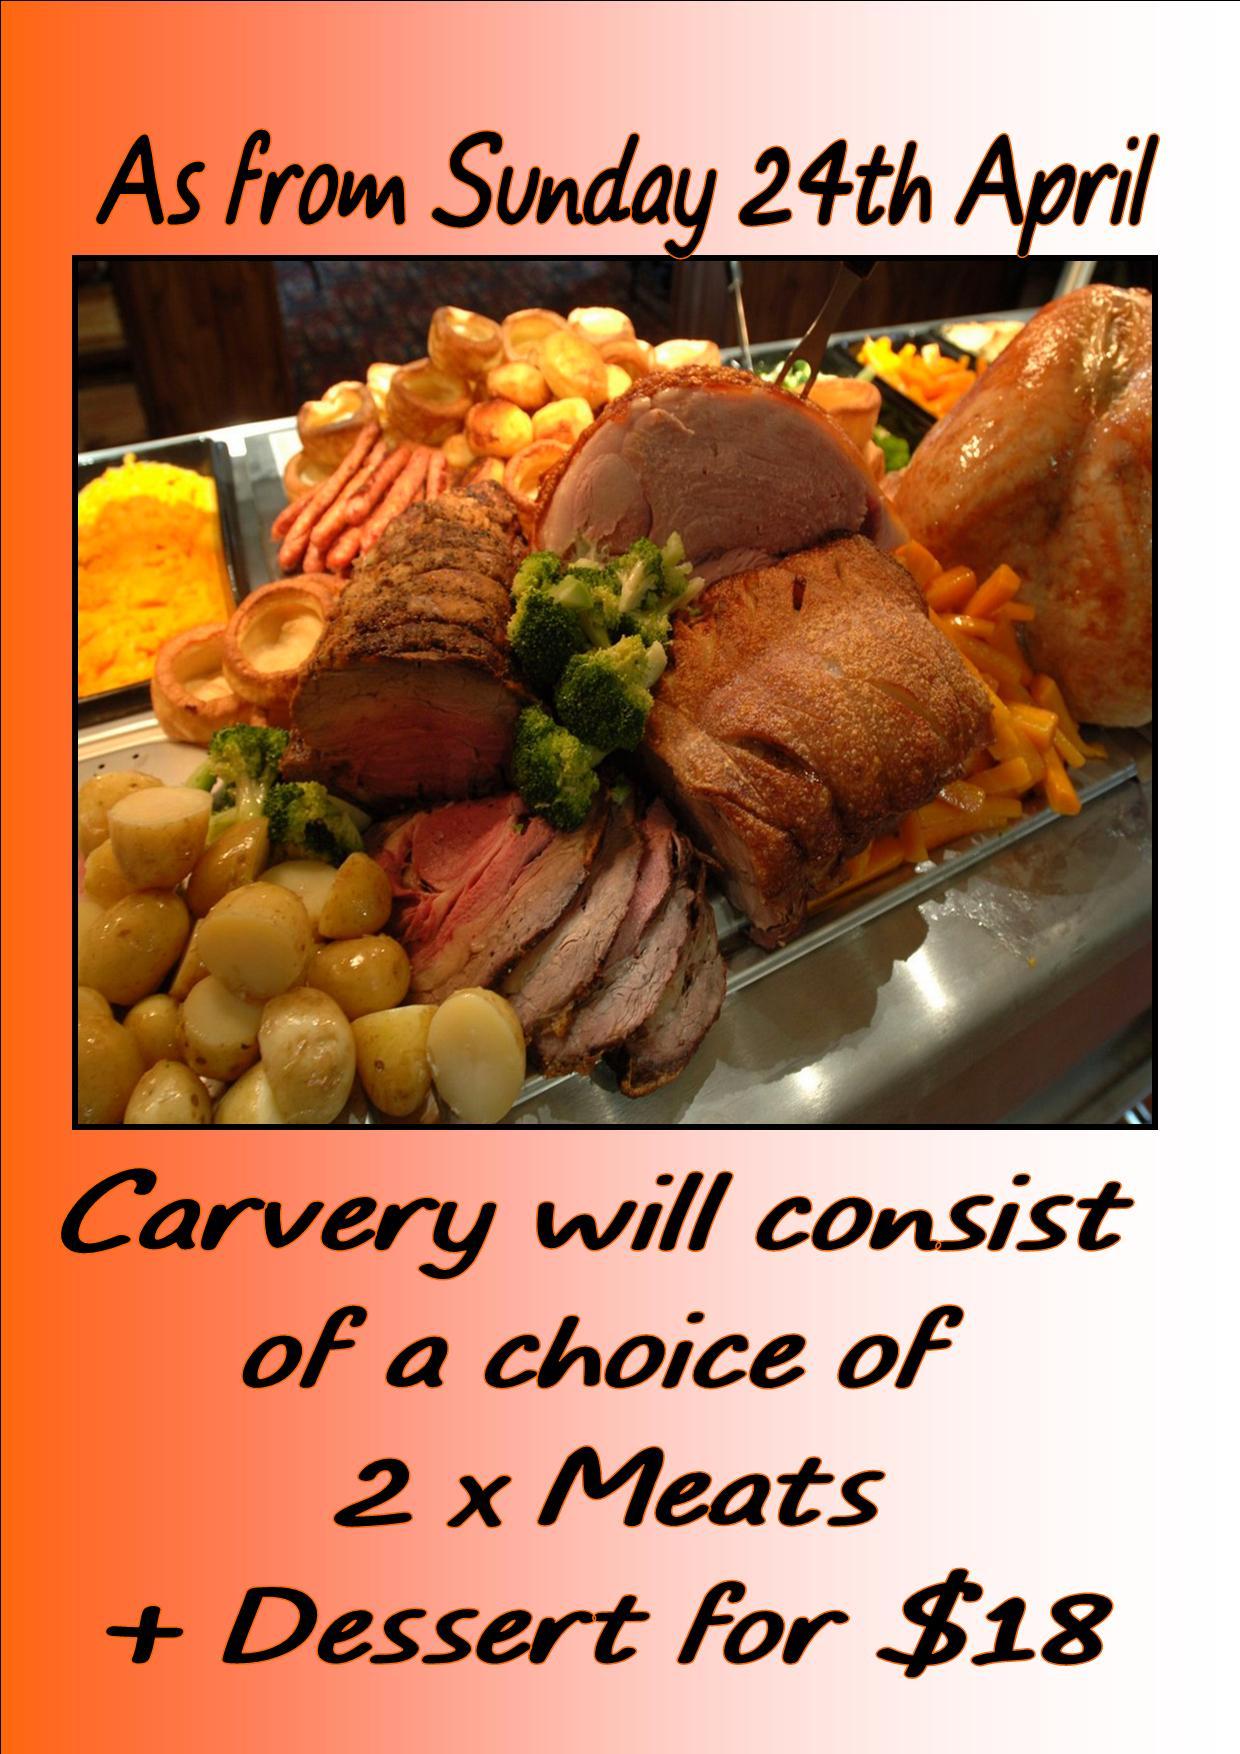 Carvery Sunday $18-24th